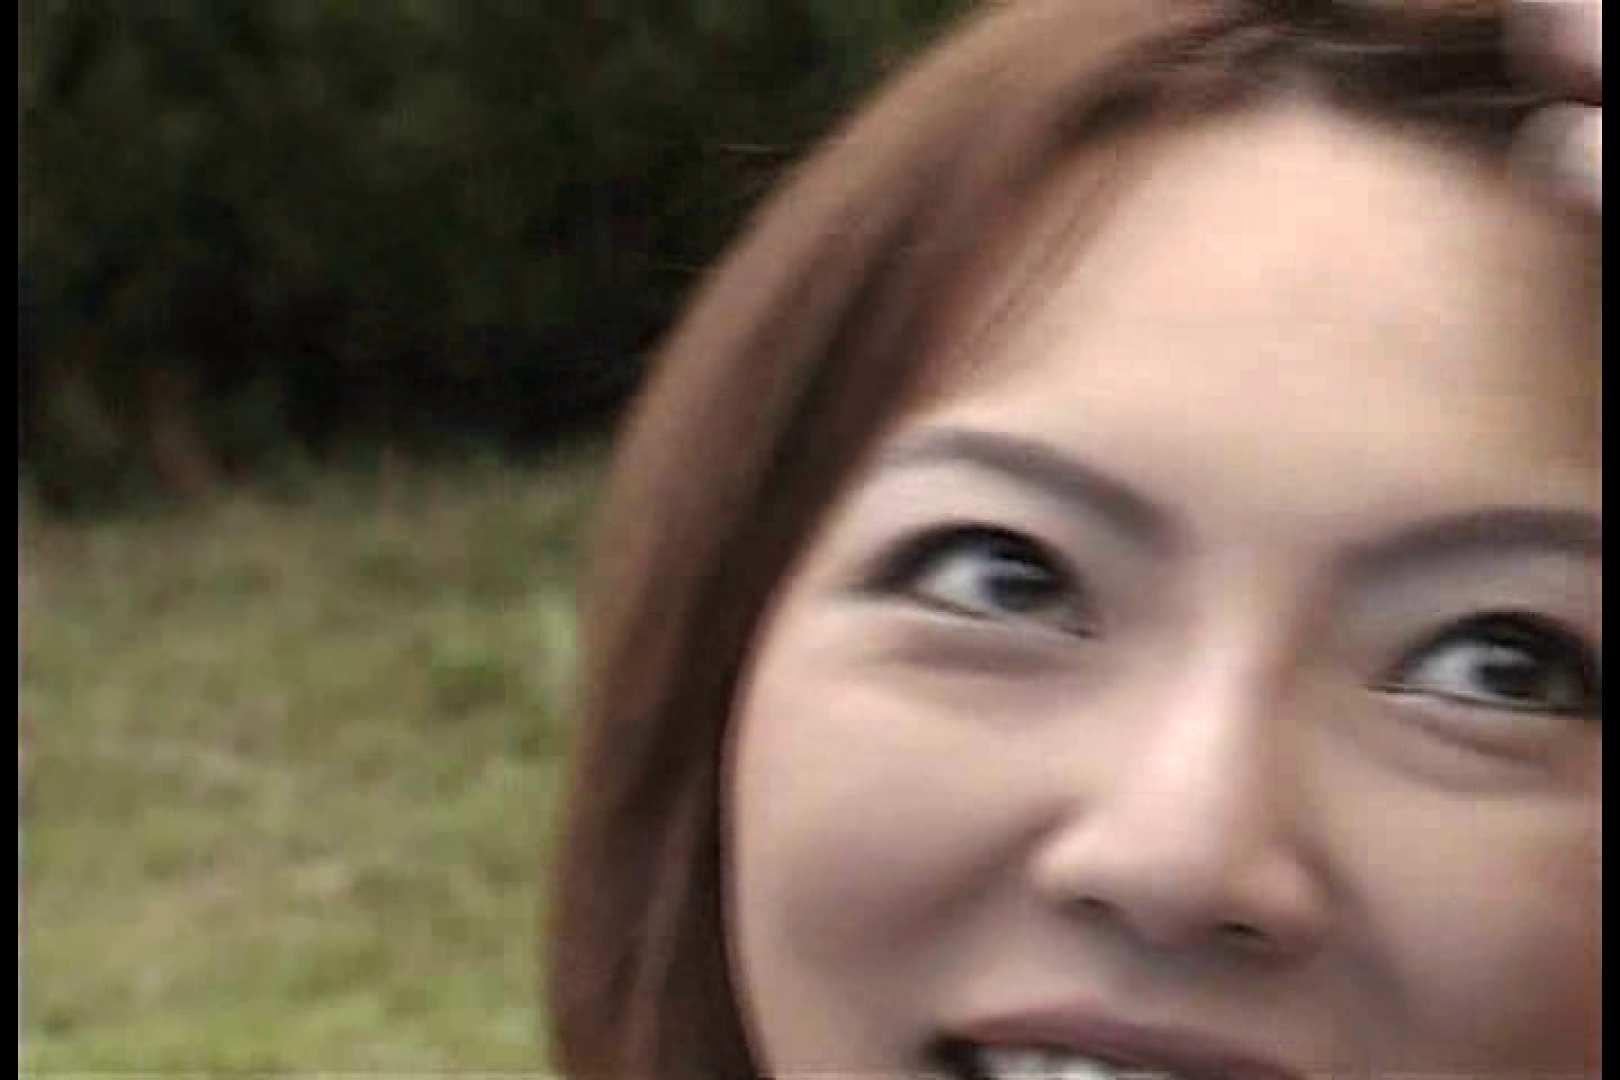 RQカメラ地獄Vol.4 マンコ スケベ動画紹介 104pic 68